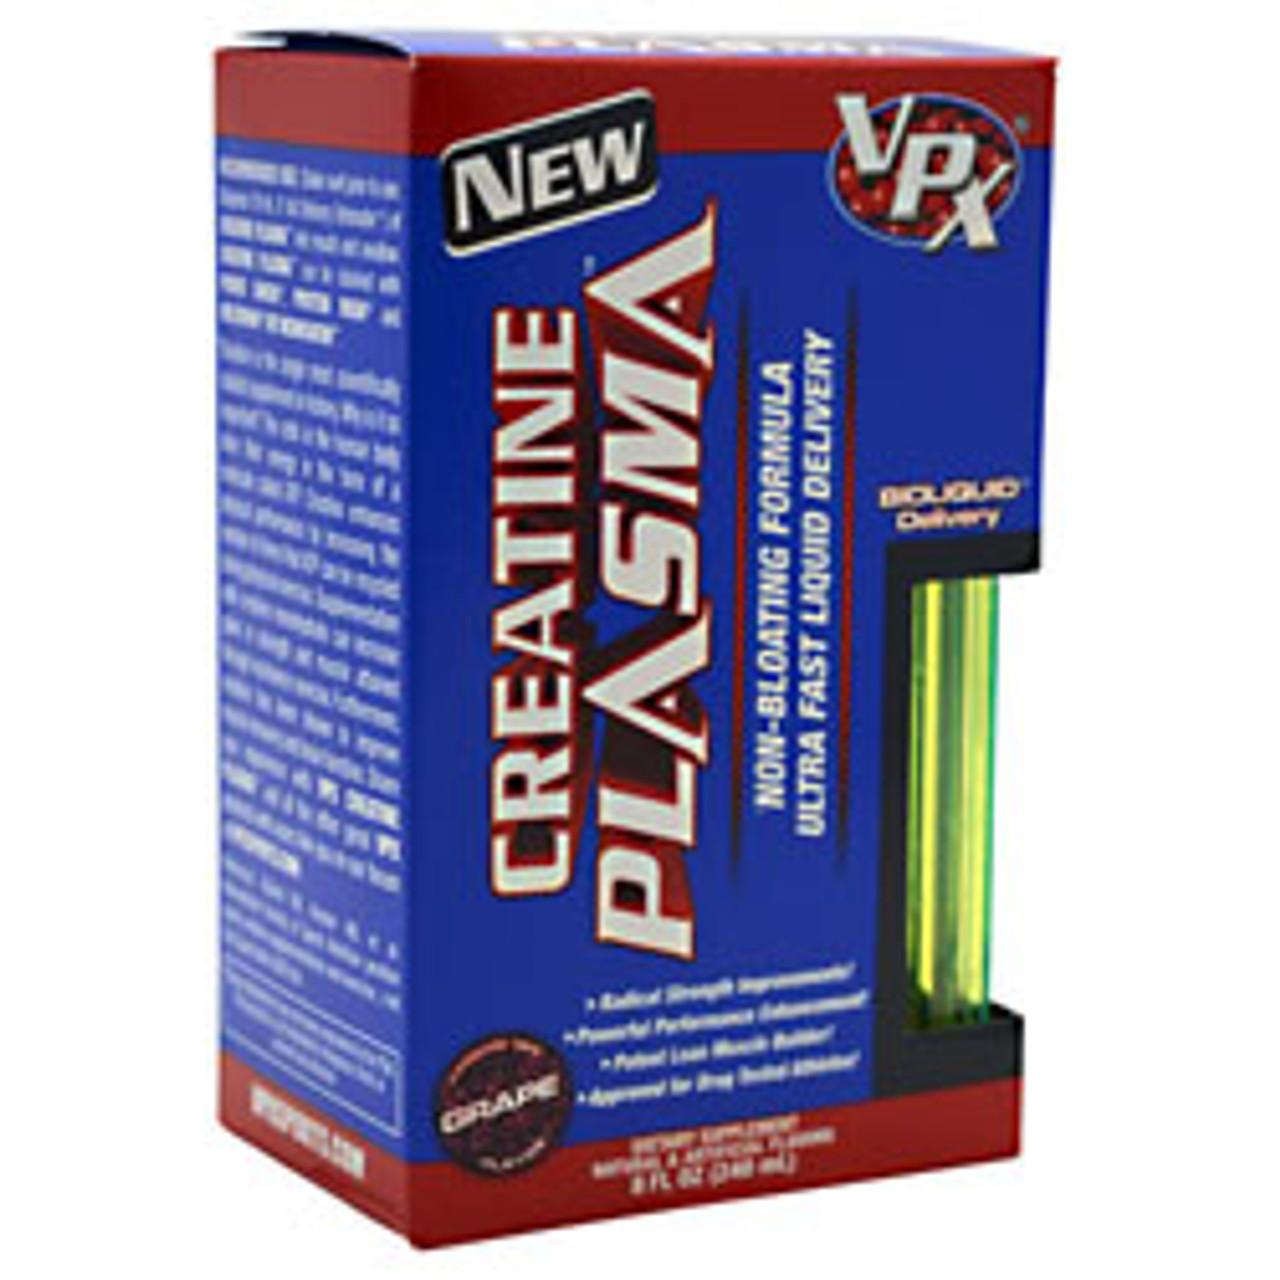 Creatine Plasma by VPX Sports